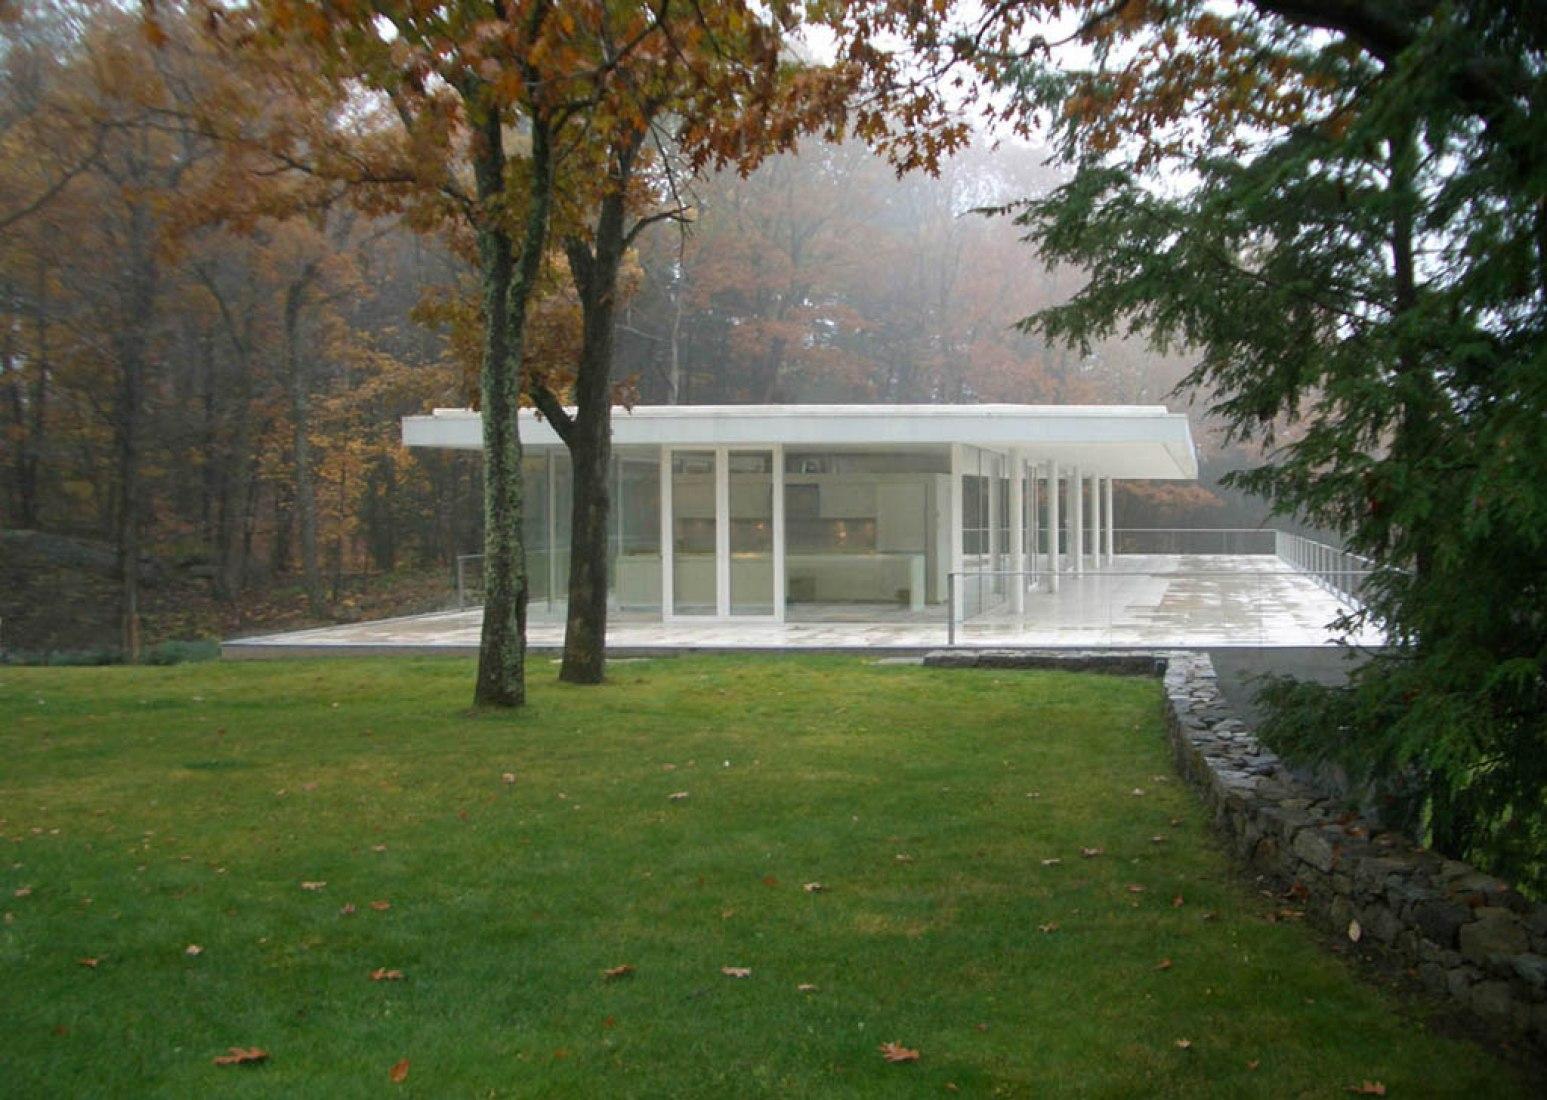 Casa Olnick Spanu. Courtesy of Alberto Campo Baeza.